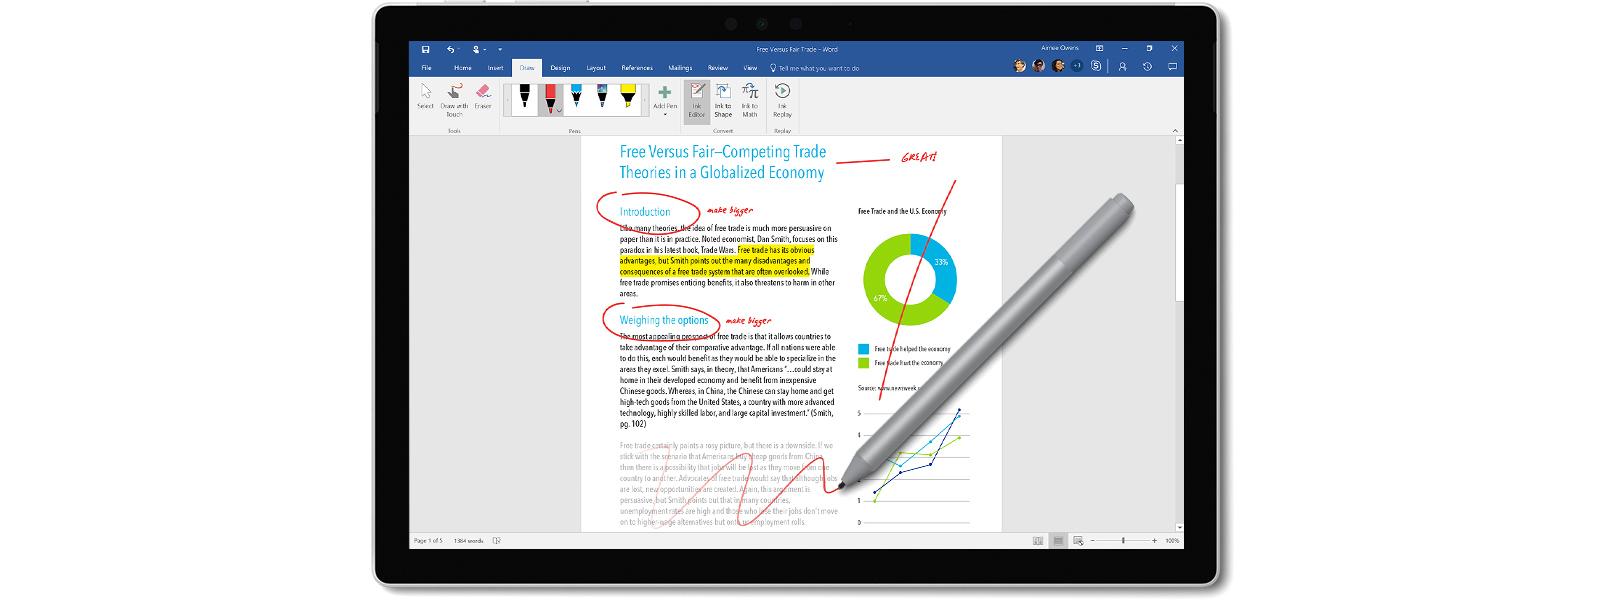 Surface 触控笔编辑页面的屏幕截图,其中包含注释、突出显示的内容、删除线和圈起来的选定文本。